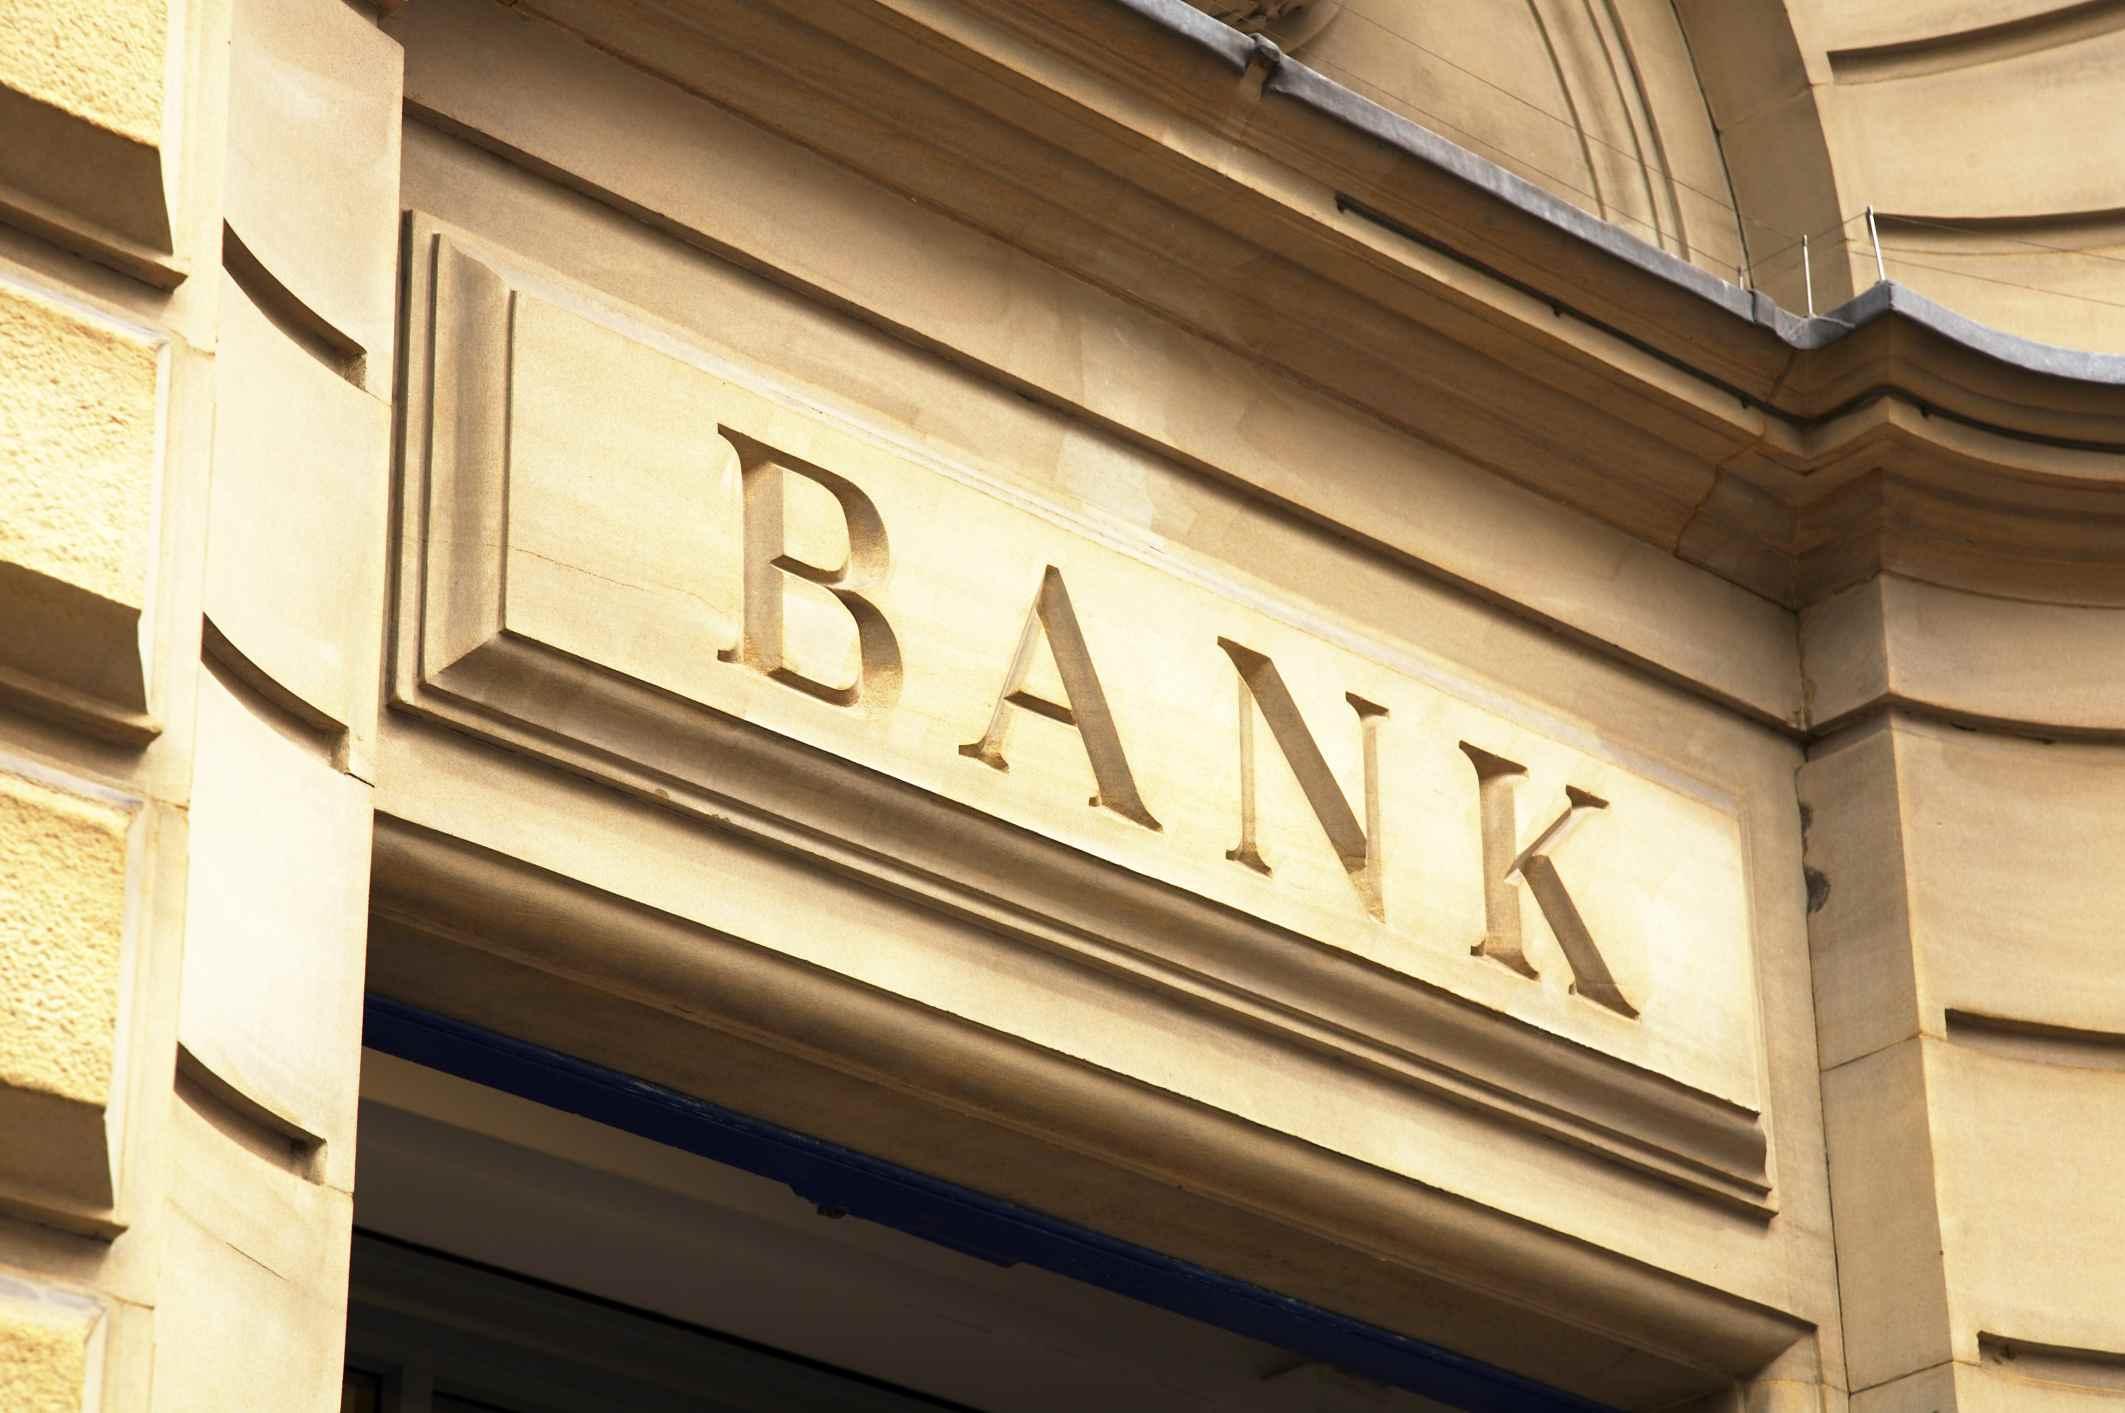 Bank Definition